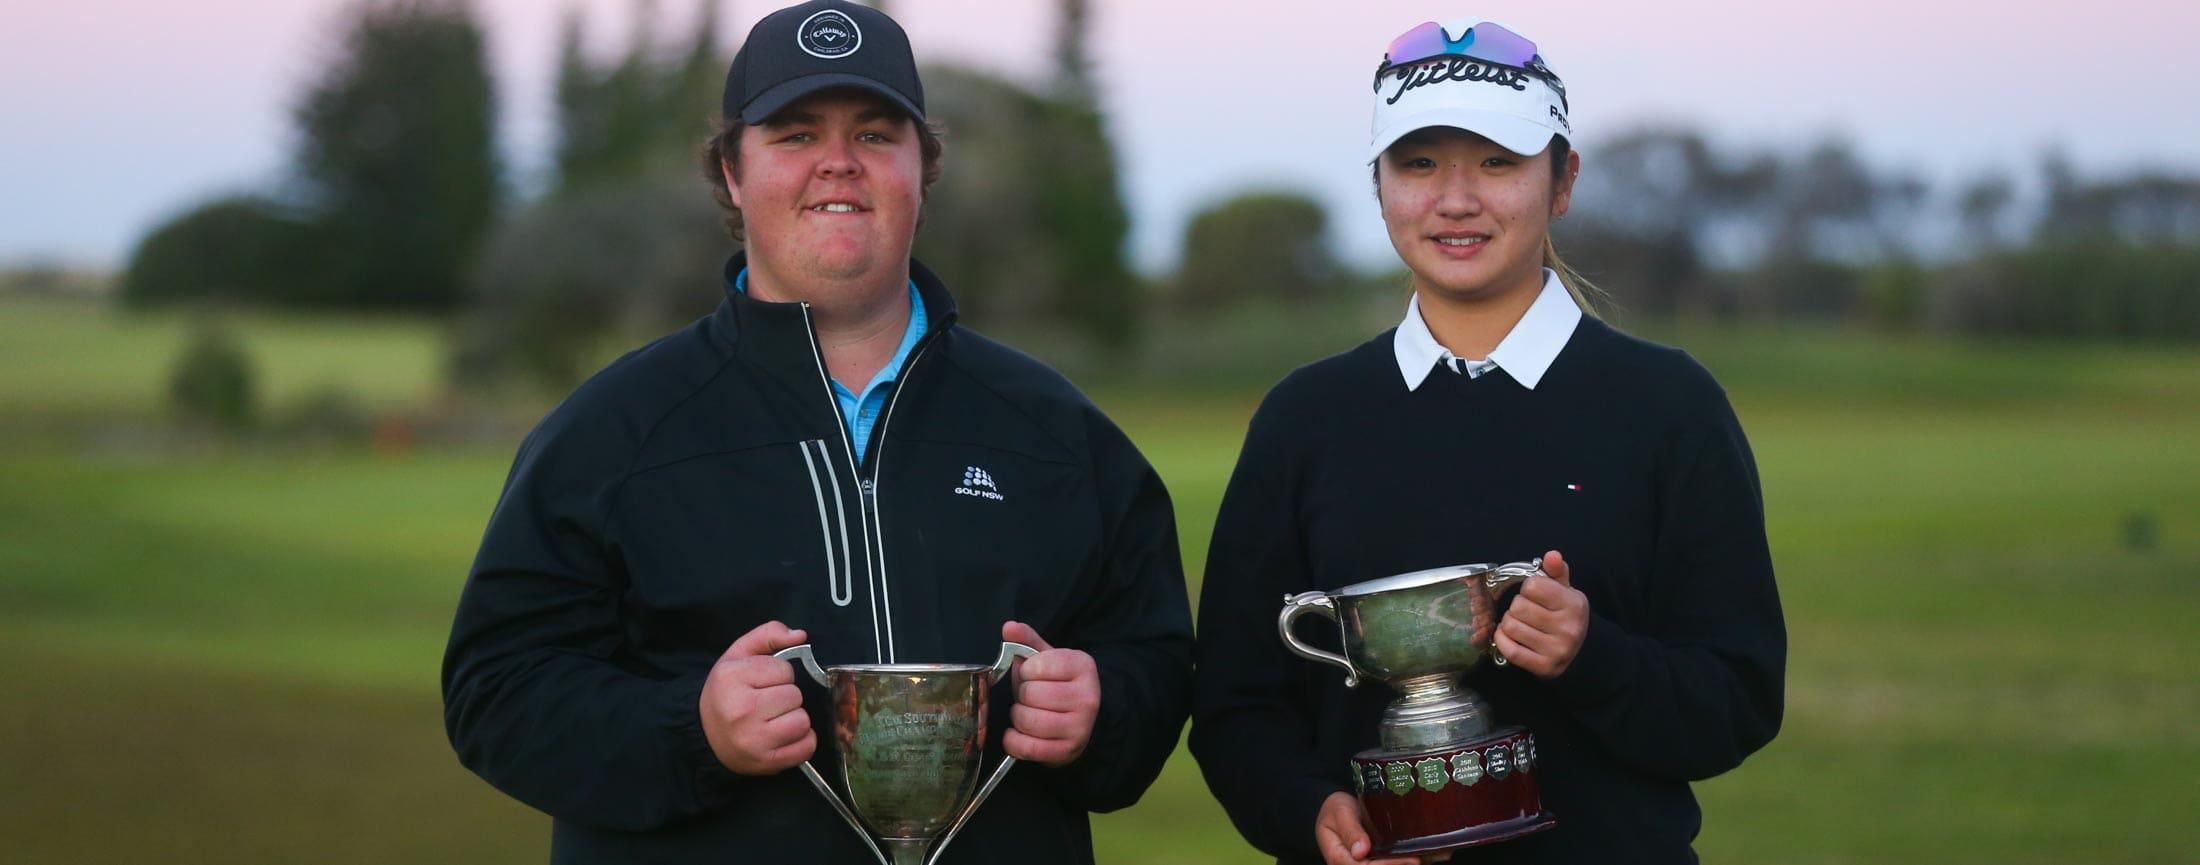 Corey Lamb Hye Park with NSW Jnr Trophies